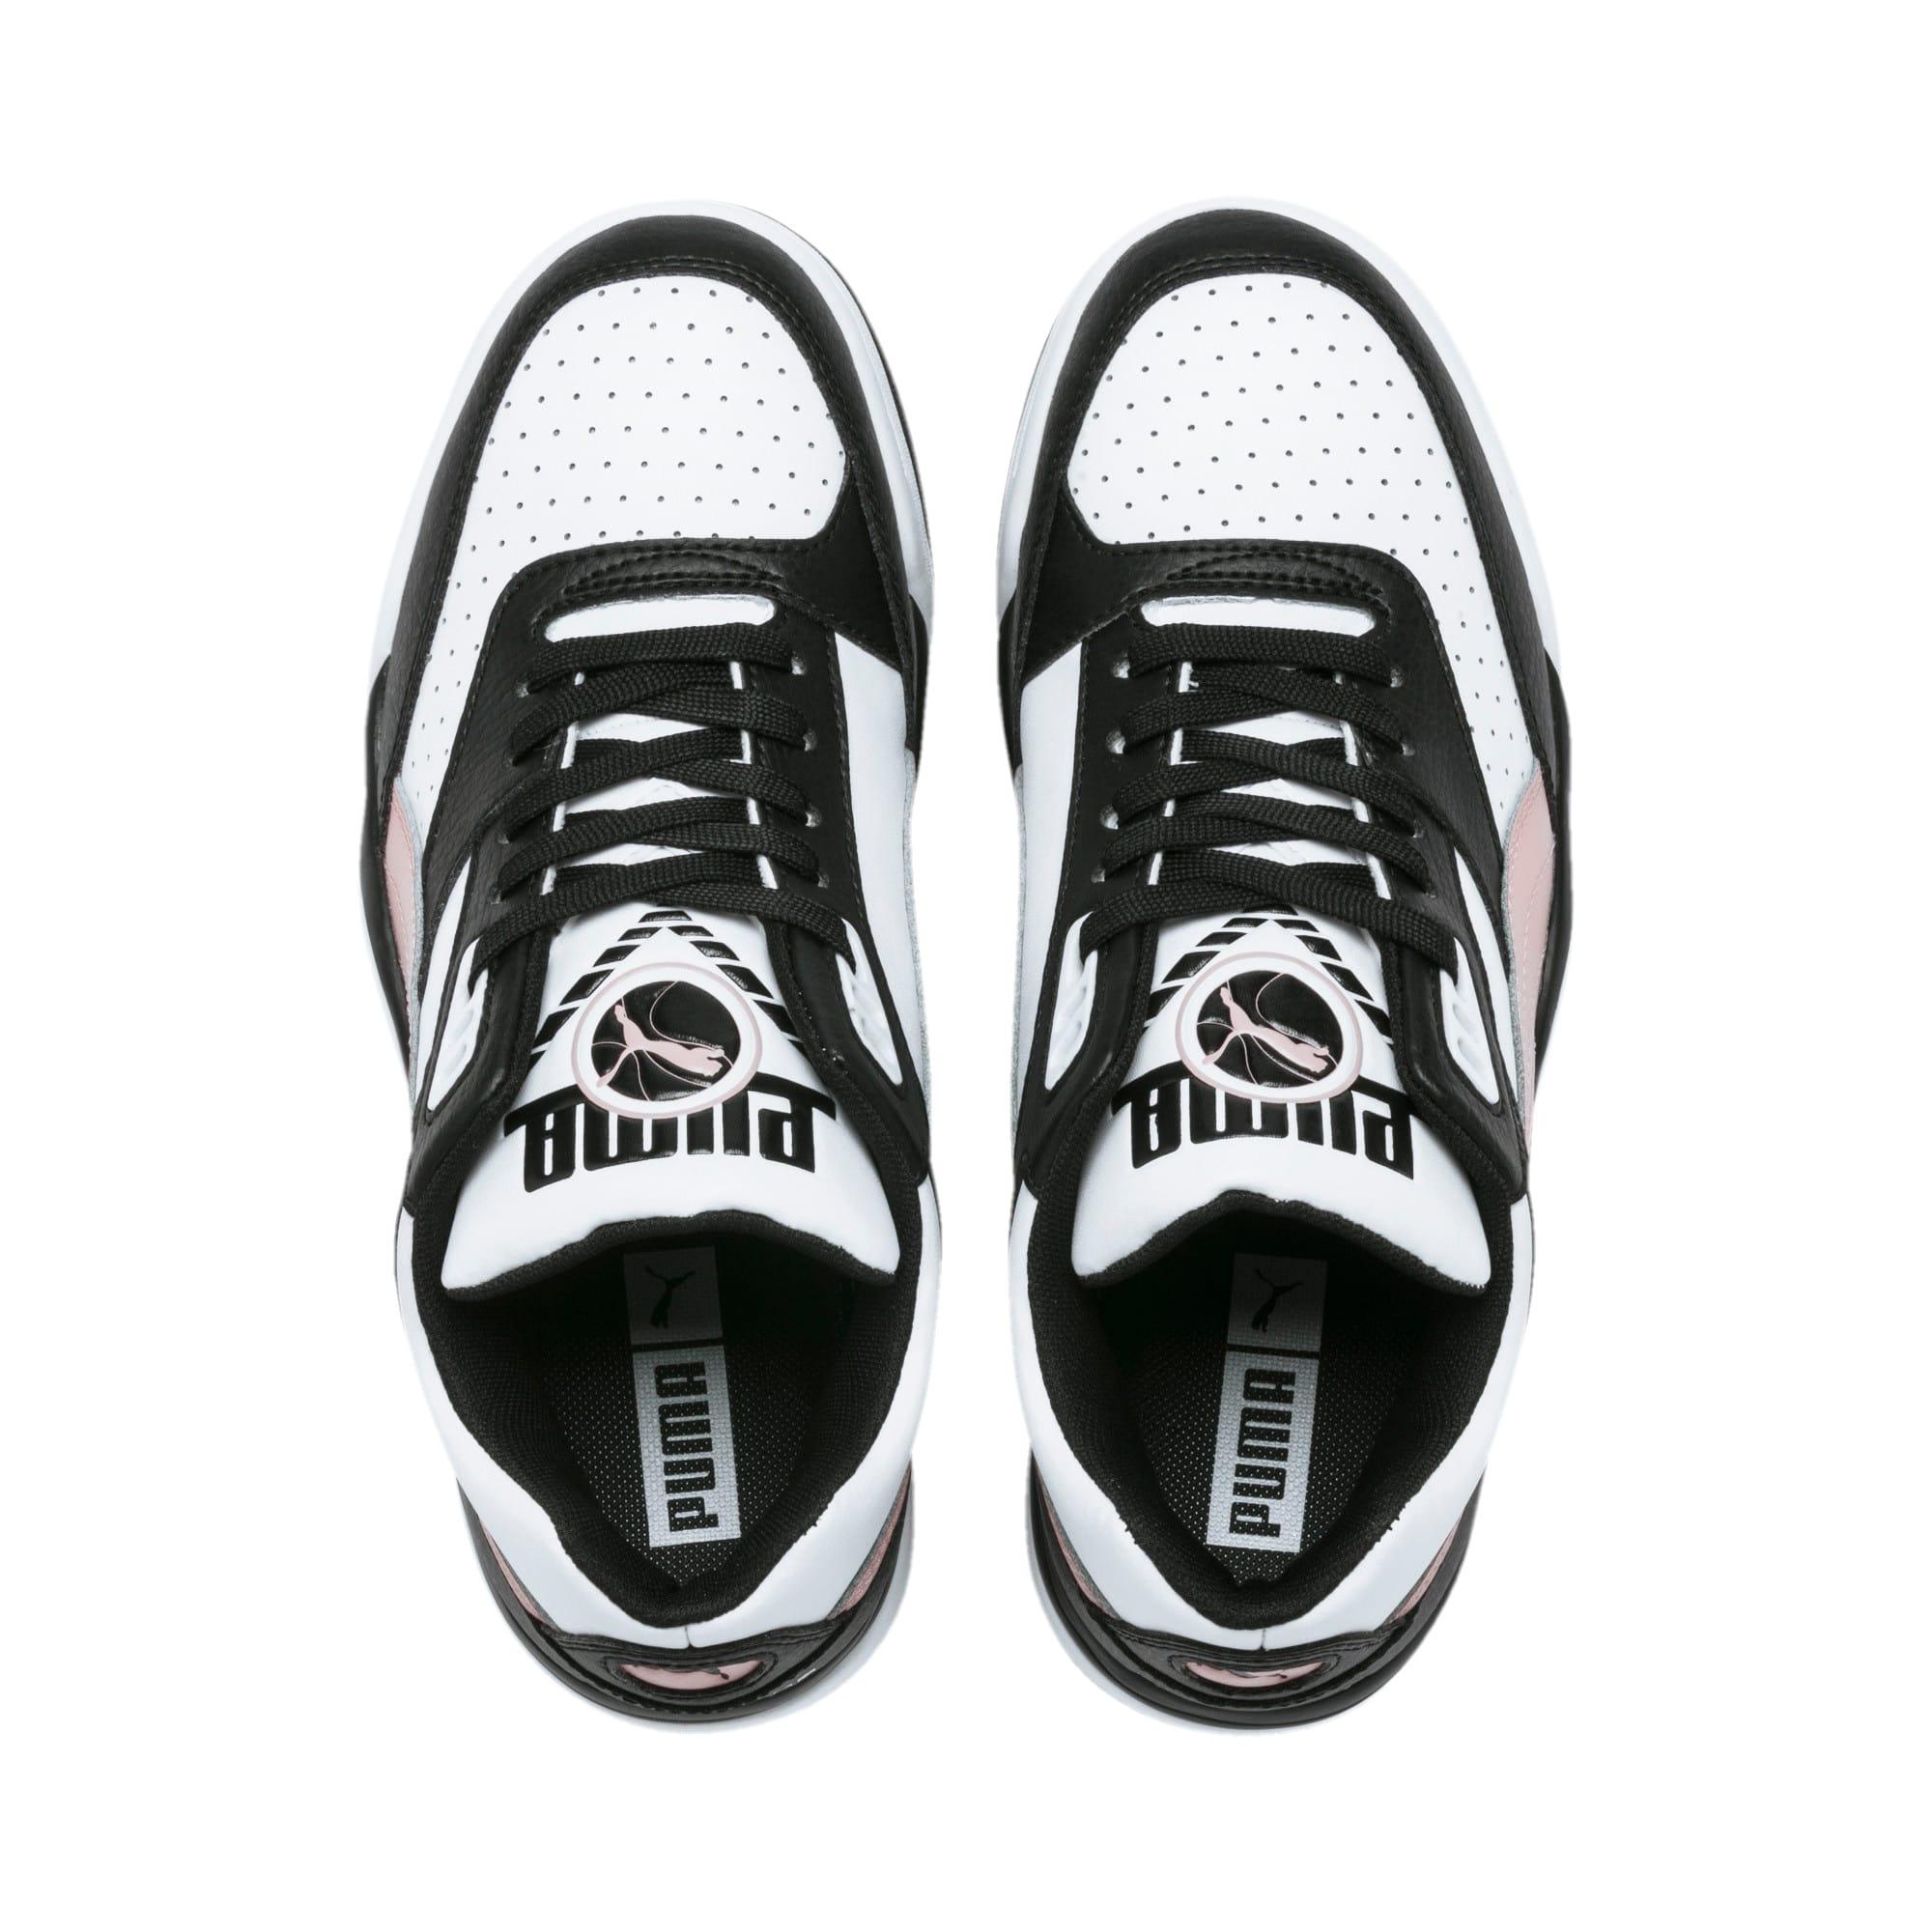 Thumbnail 7 of Palace Guard Colorblock Women's Sneakers, Puma Black-Puma White, medium